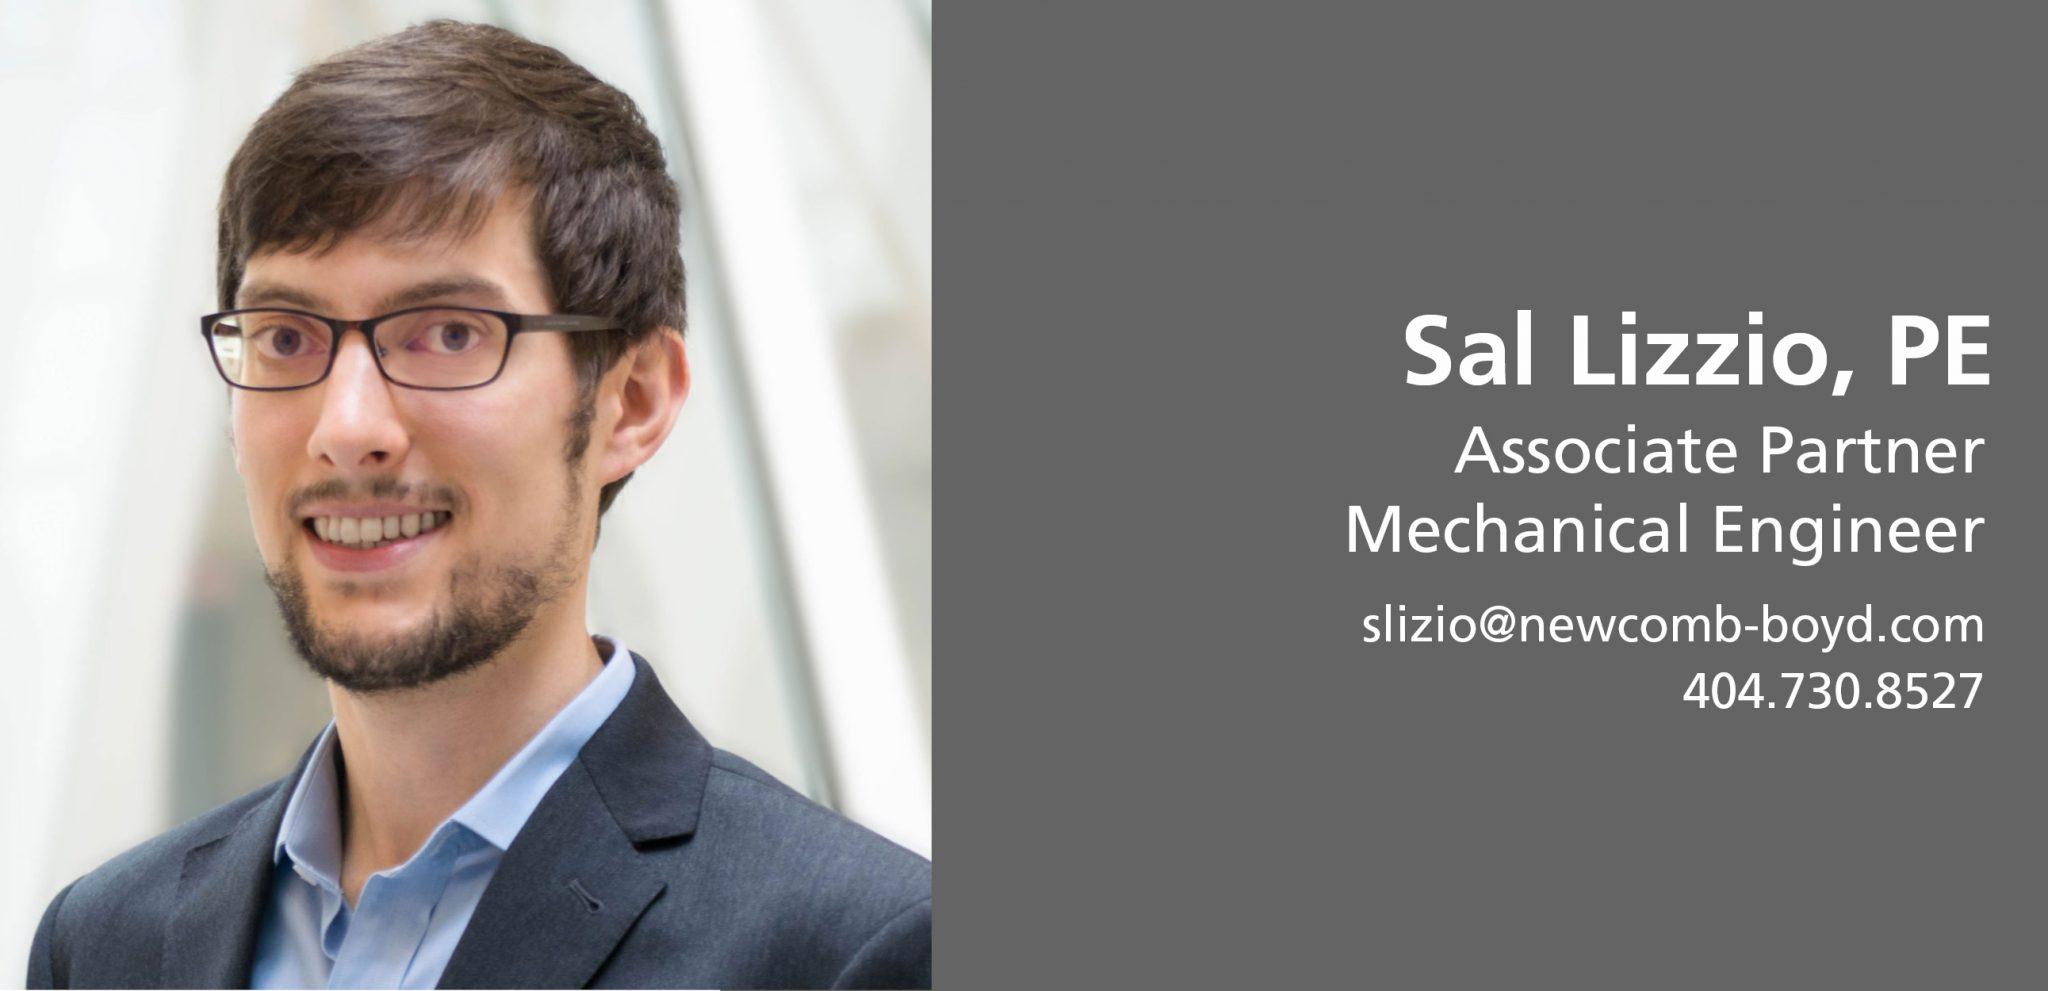 Sal Lizzio, PE - AP